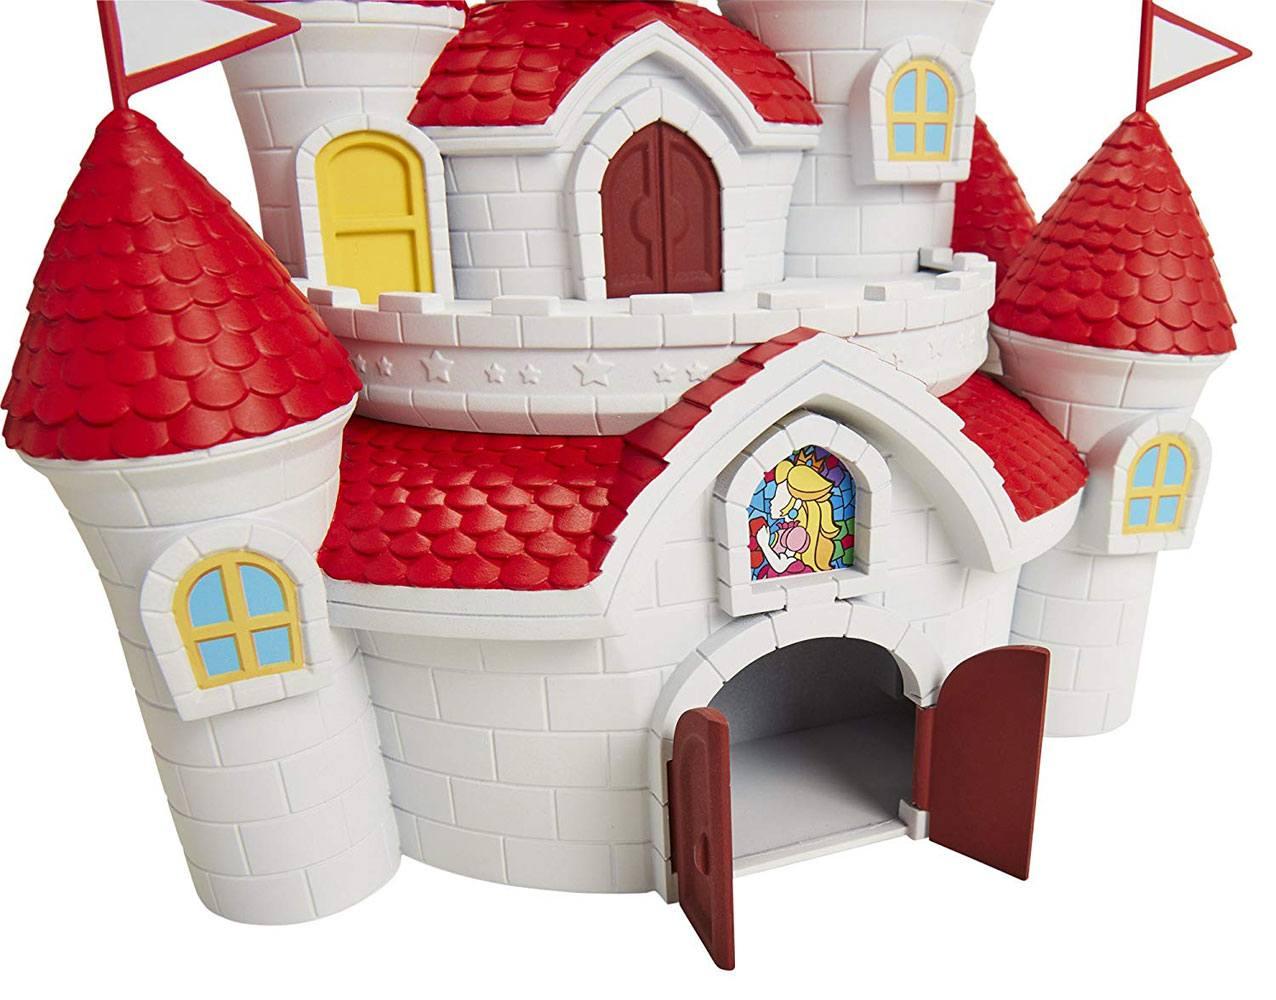 World of Nintendo Deluxe Playset Super Mario Mushroom Kingdom Castle